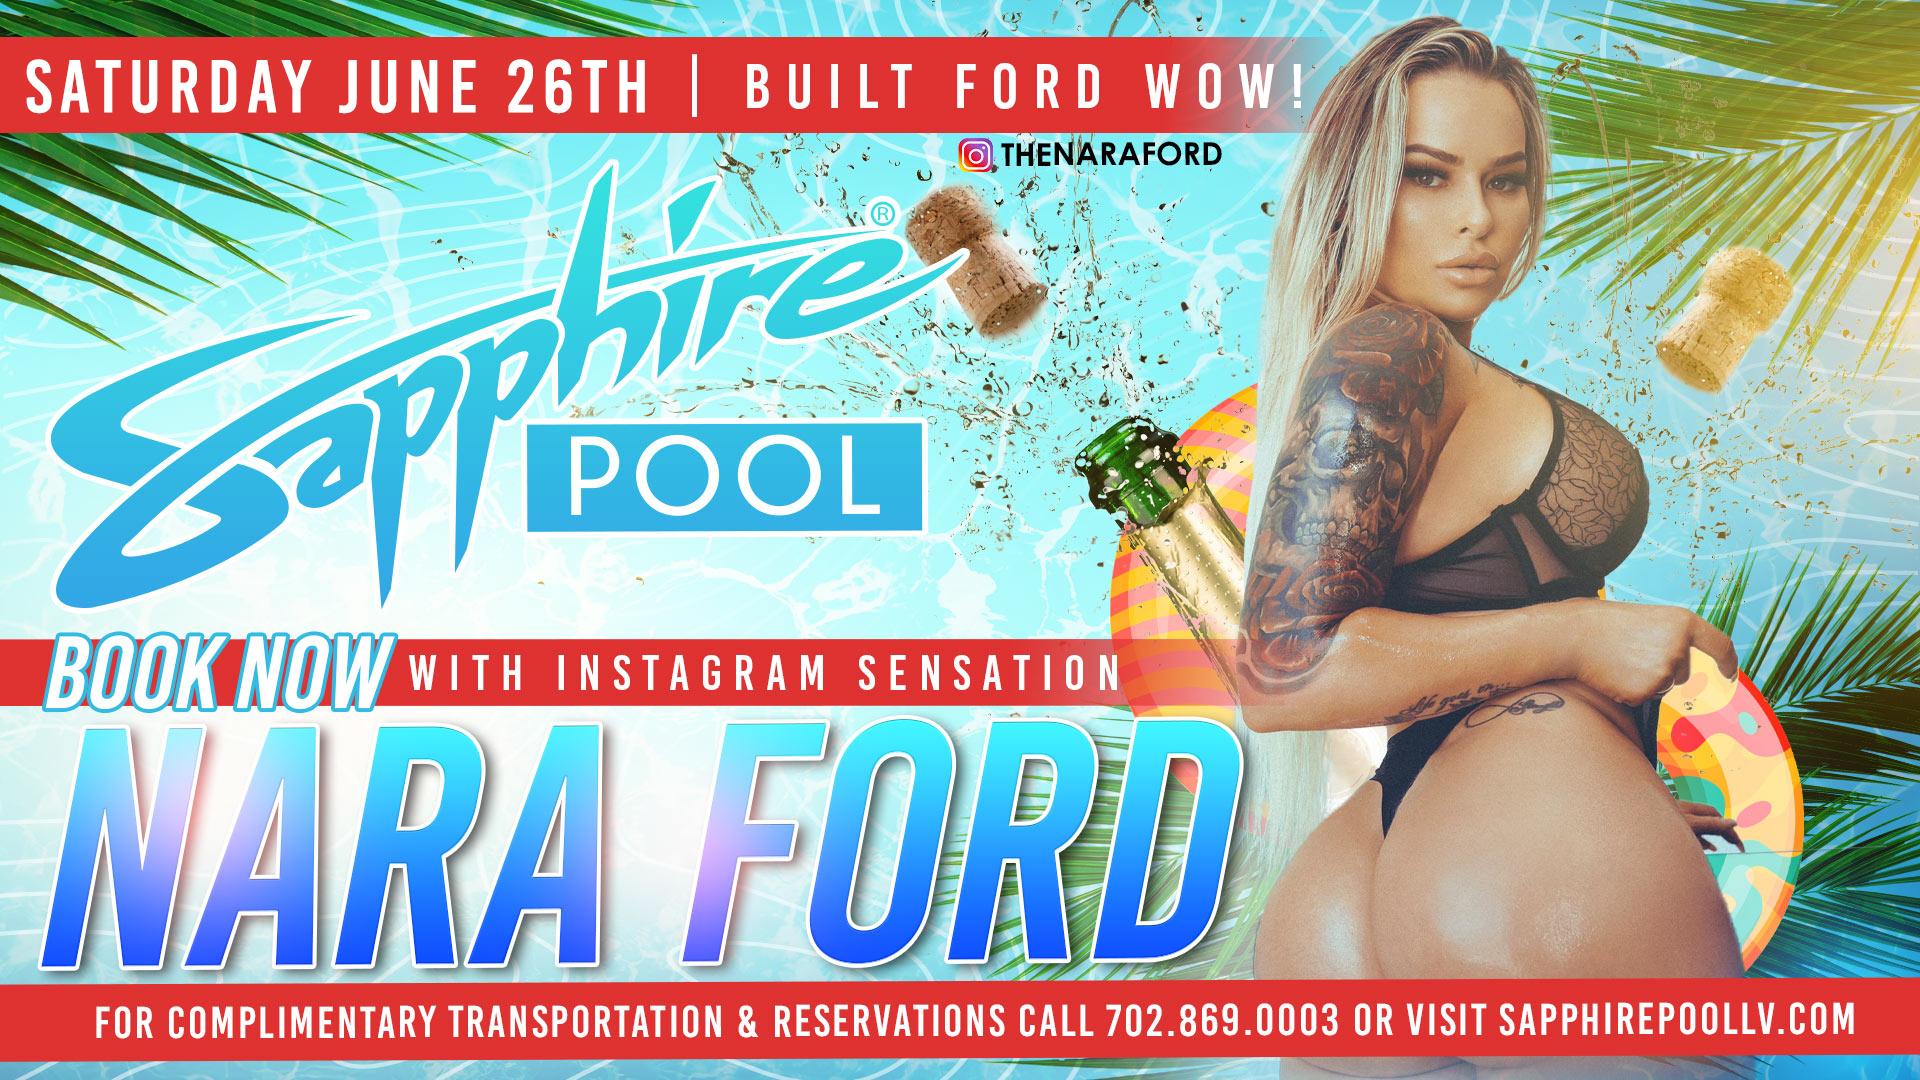 Social Media Super Star Nara Ford Hosts Sapphire Pool & Dayclub on June 26th